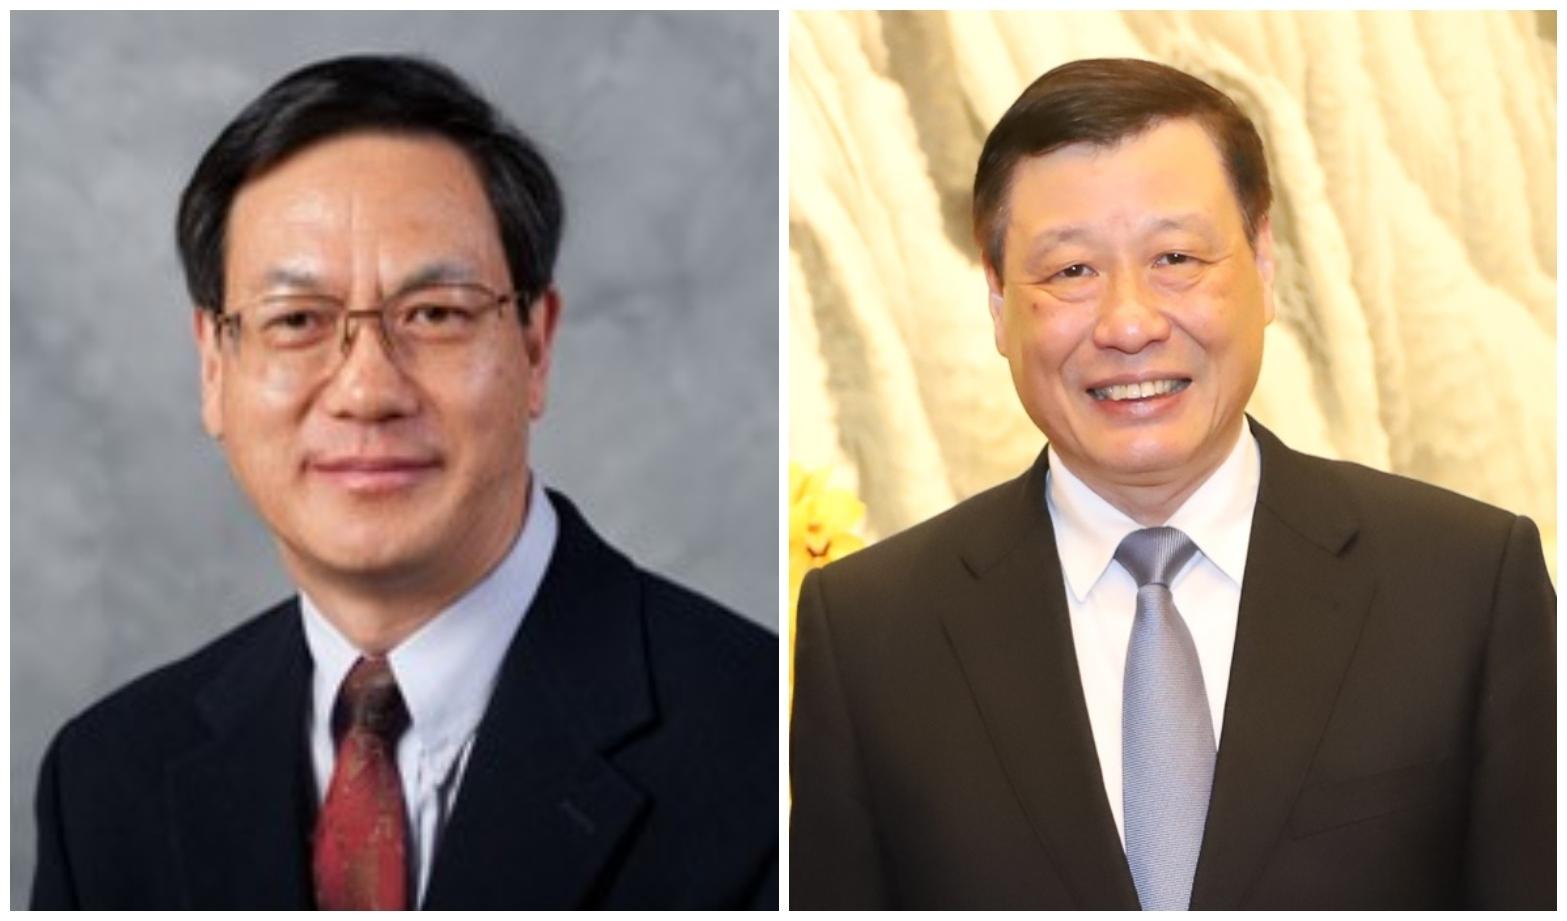 Echan a 2 miembros del Partido Comunista chino por ineficiencia ante Covid-19